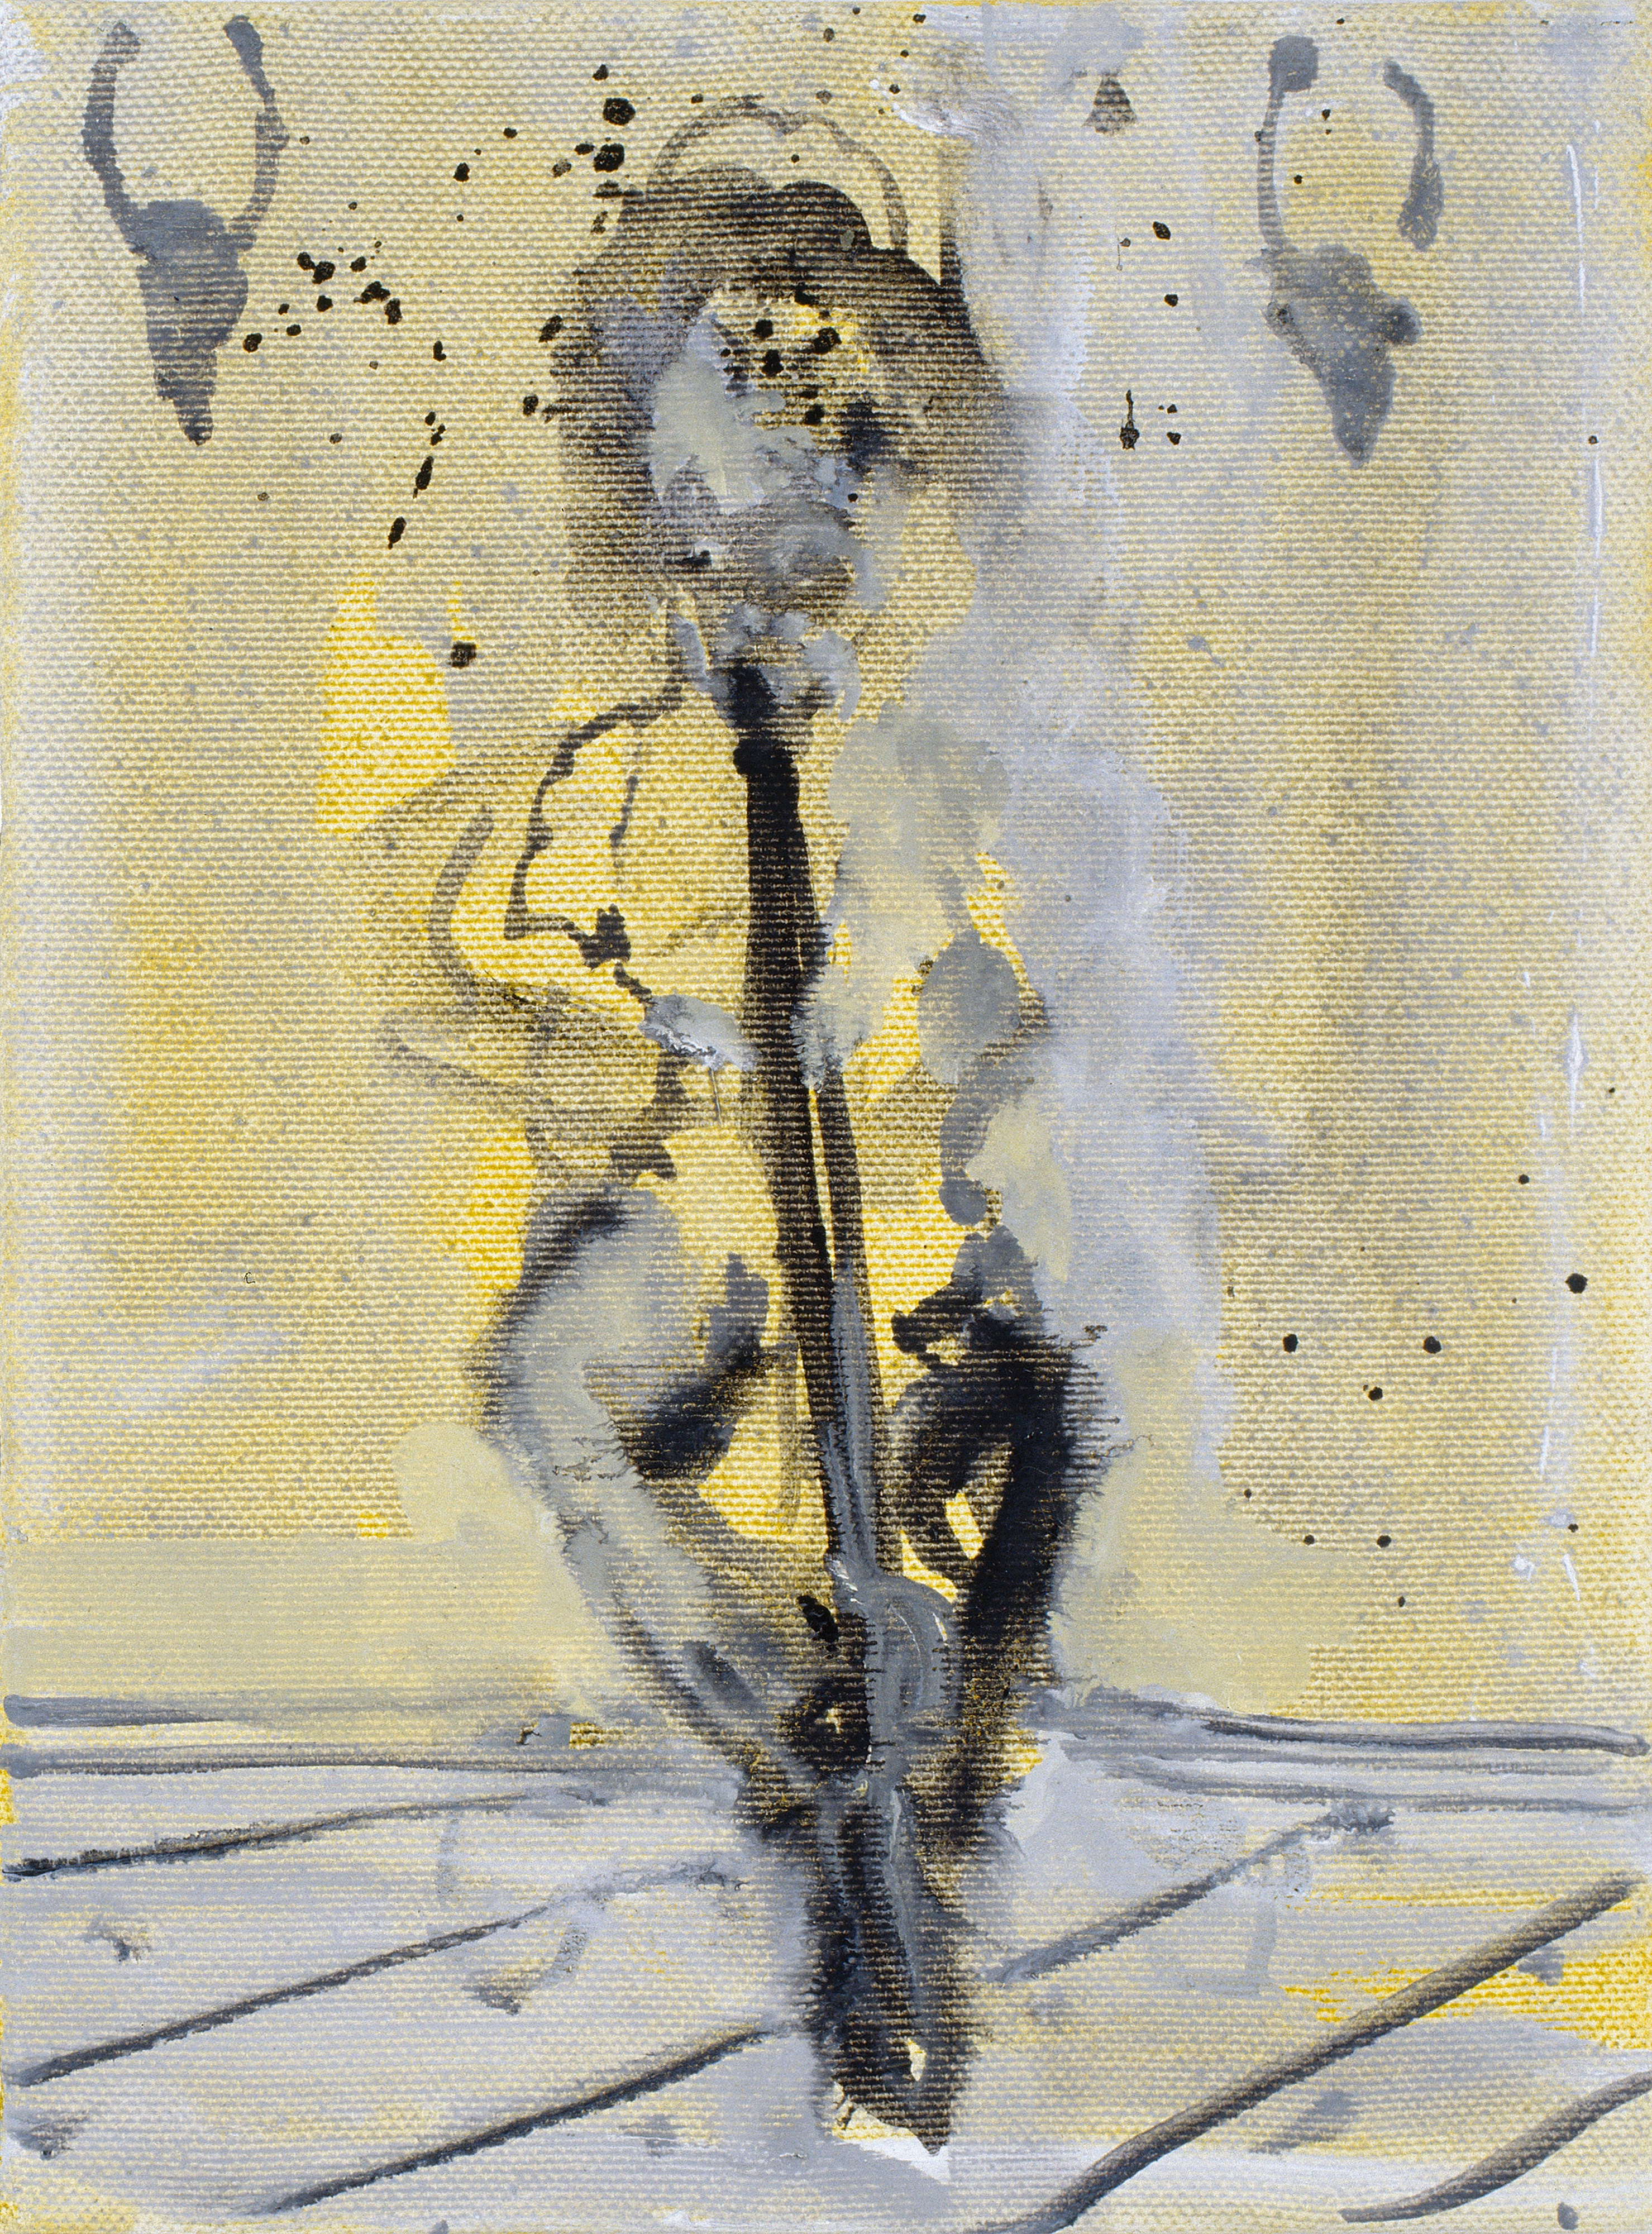 Galerie Barbara Thumm \ Valérie Favre: Suicide (With Hunting rifle) (VFa-07-097) \ Suicide (With Hunting rifle) (2007)